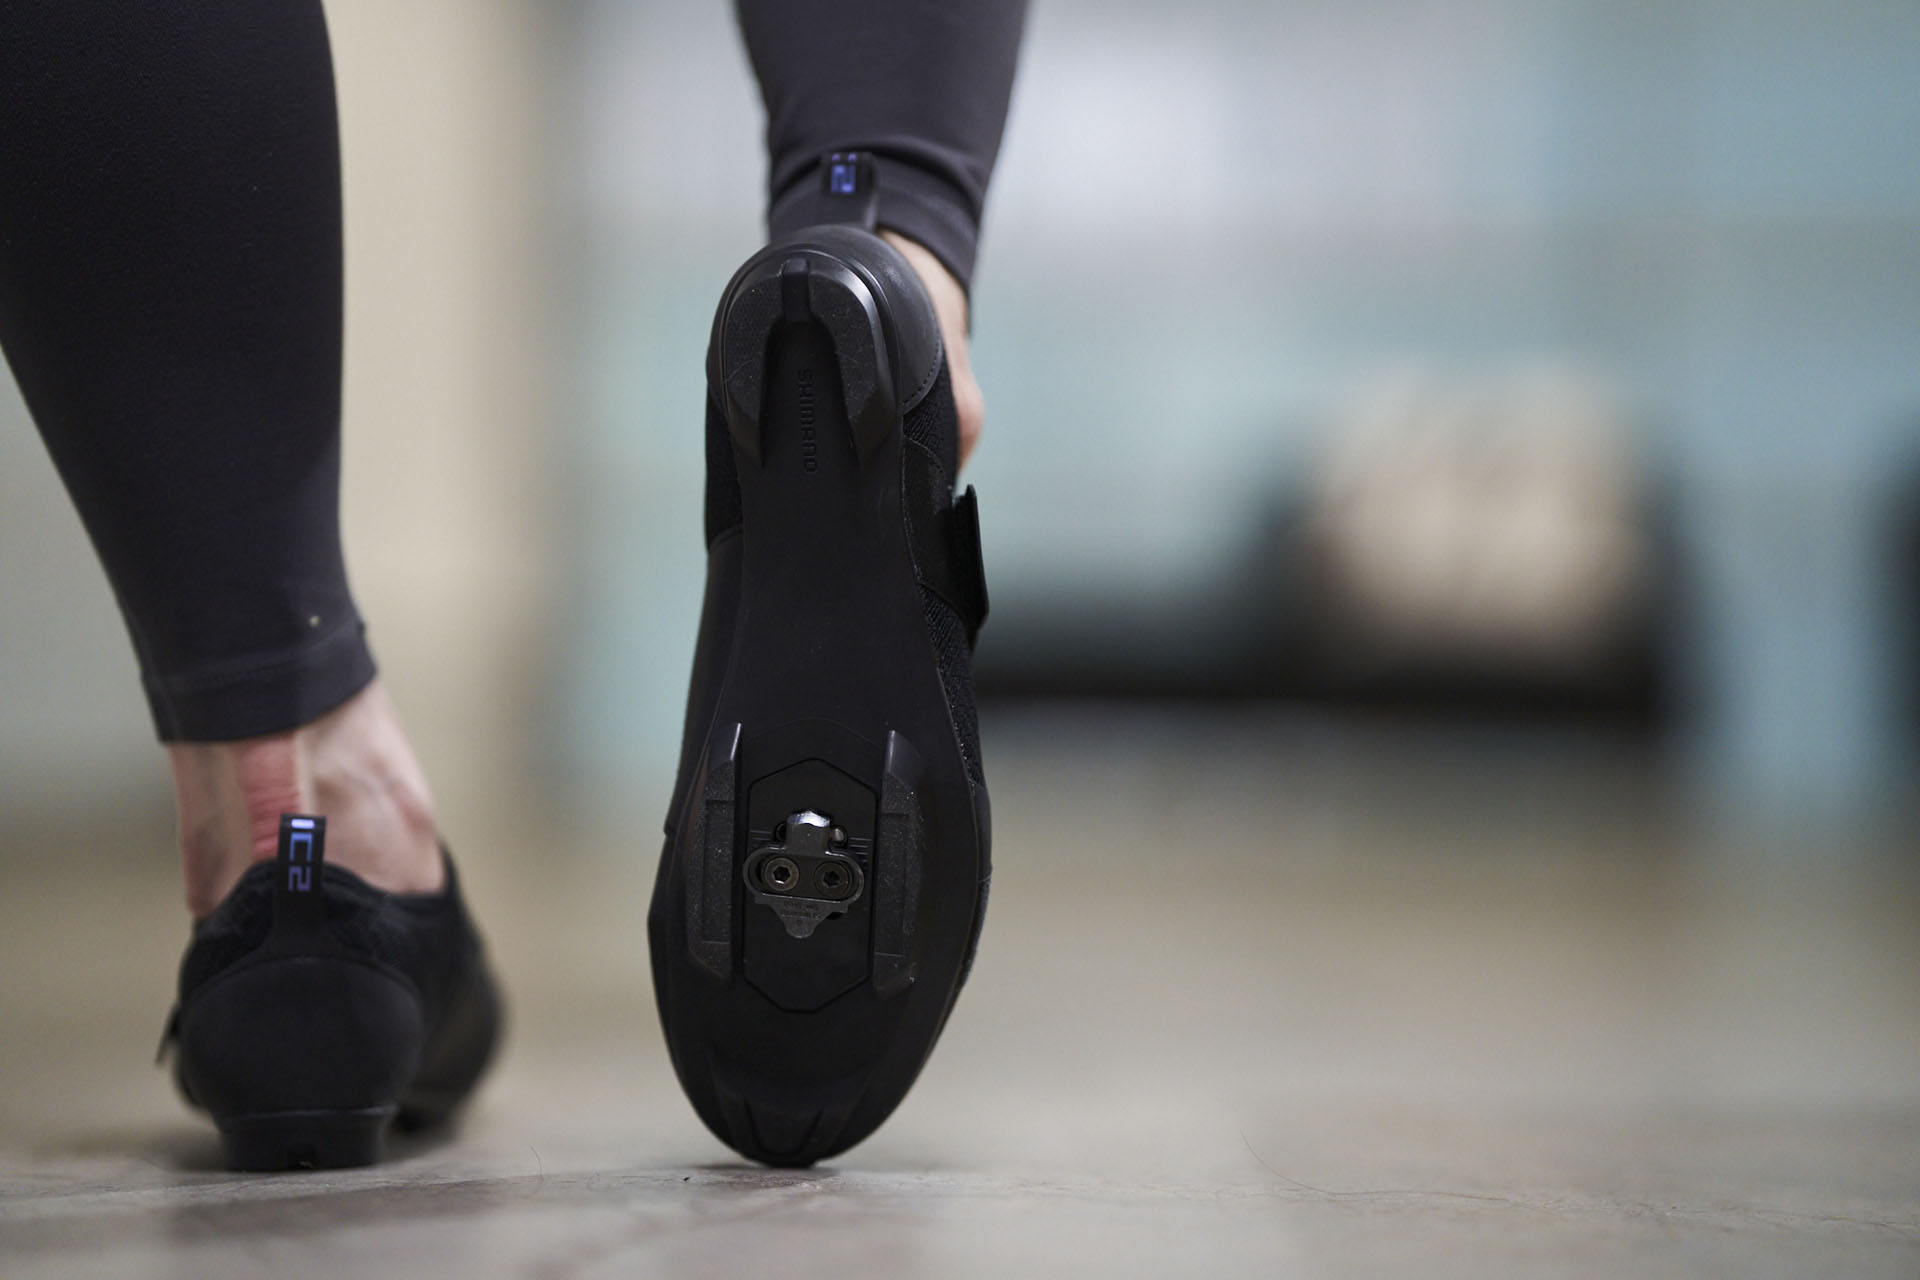 chaussures-velo-shimano-indorr-210306-0010.jpg